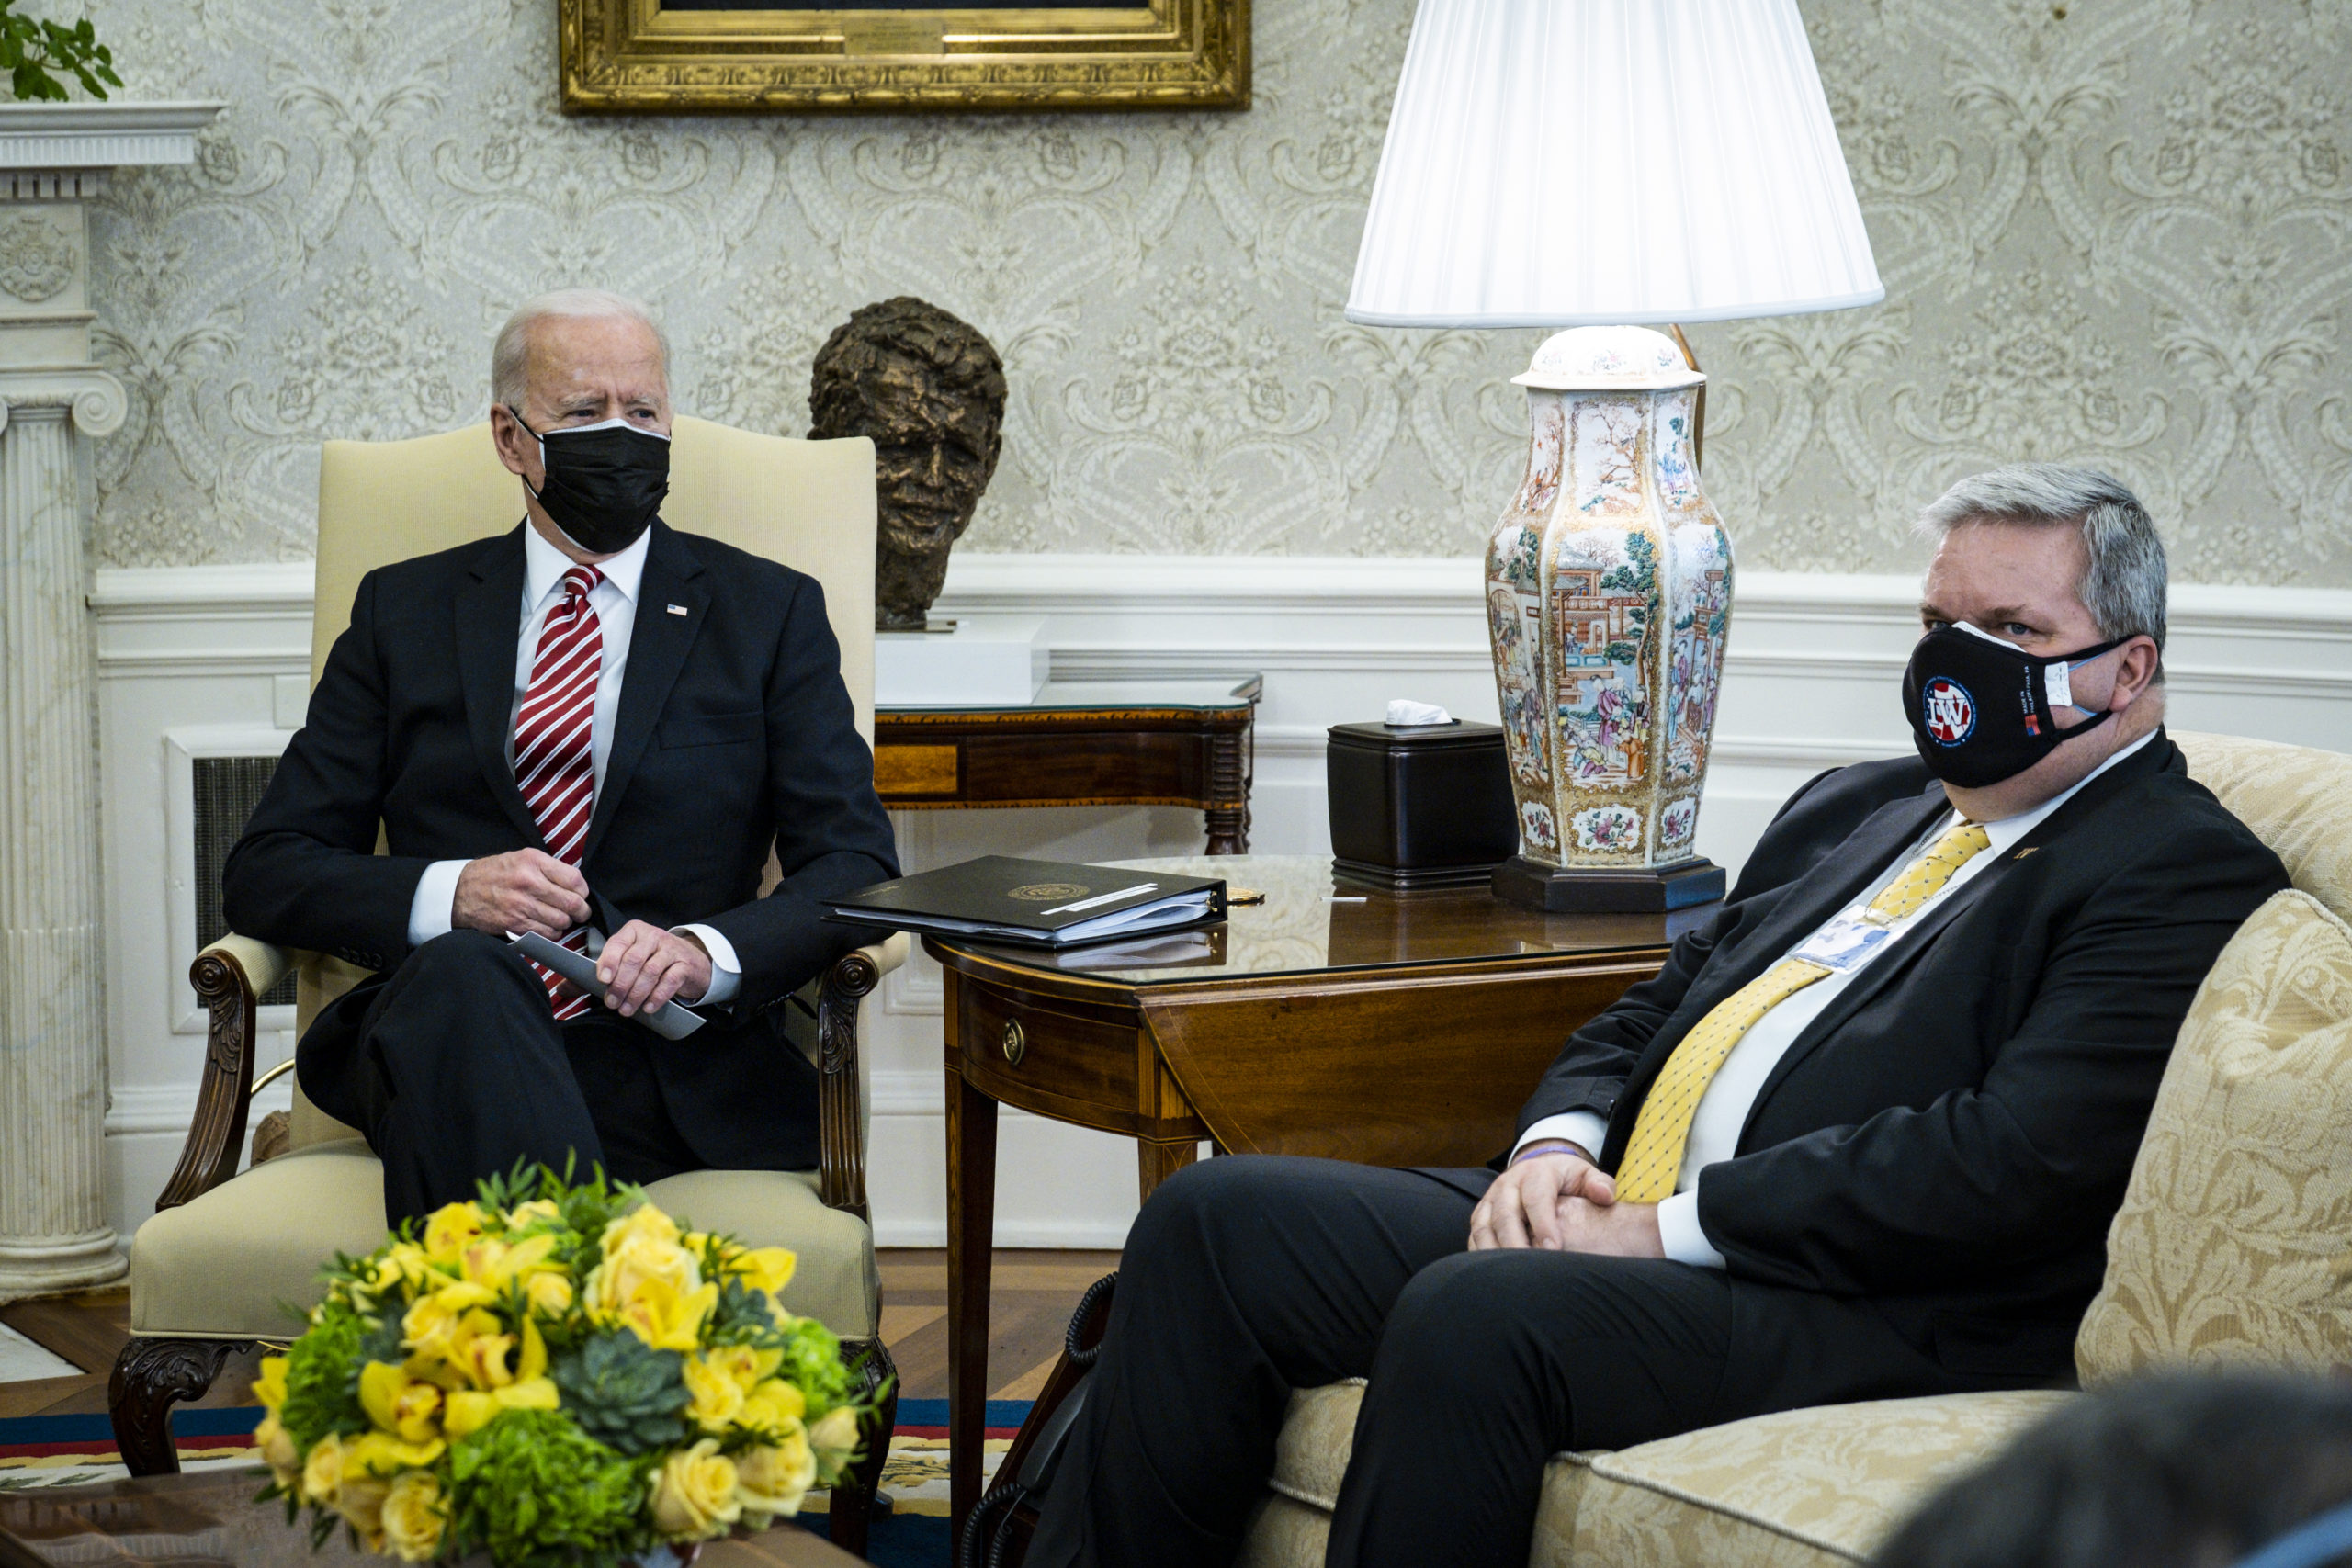 President Joe Biden meet with labor union leaders, on Feb. 17. (Pete Marovich/Pool/Getty Images)